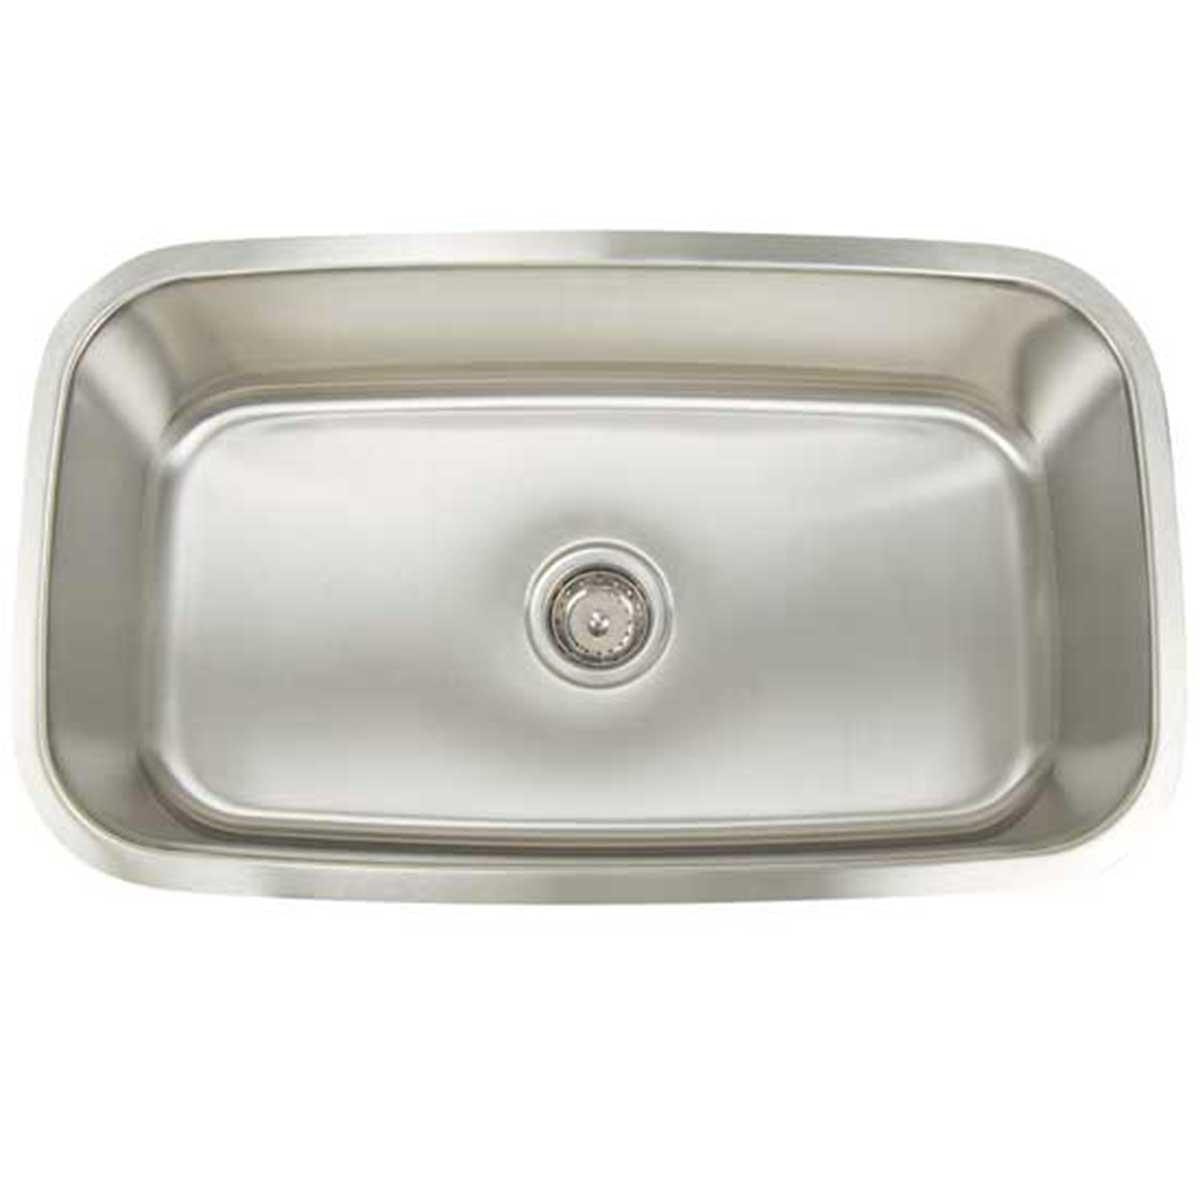 Artisan Sinks Premium Sink AR3118D9